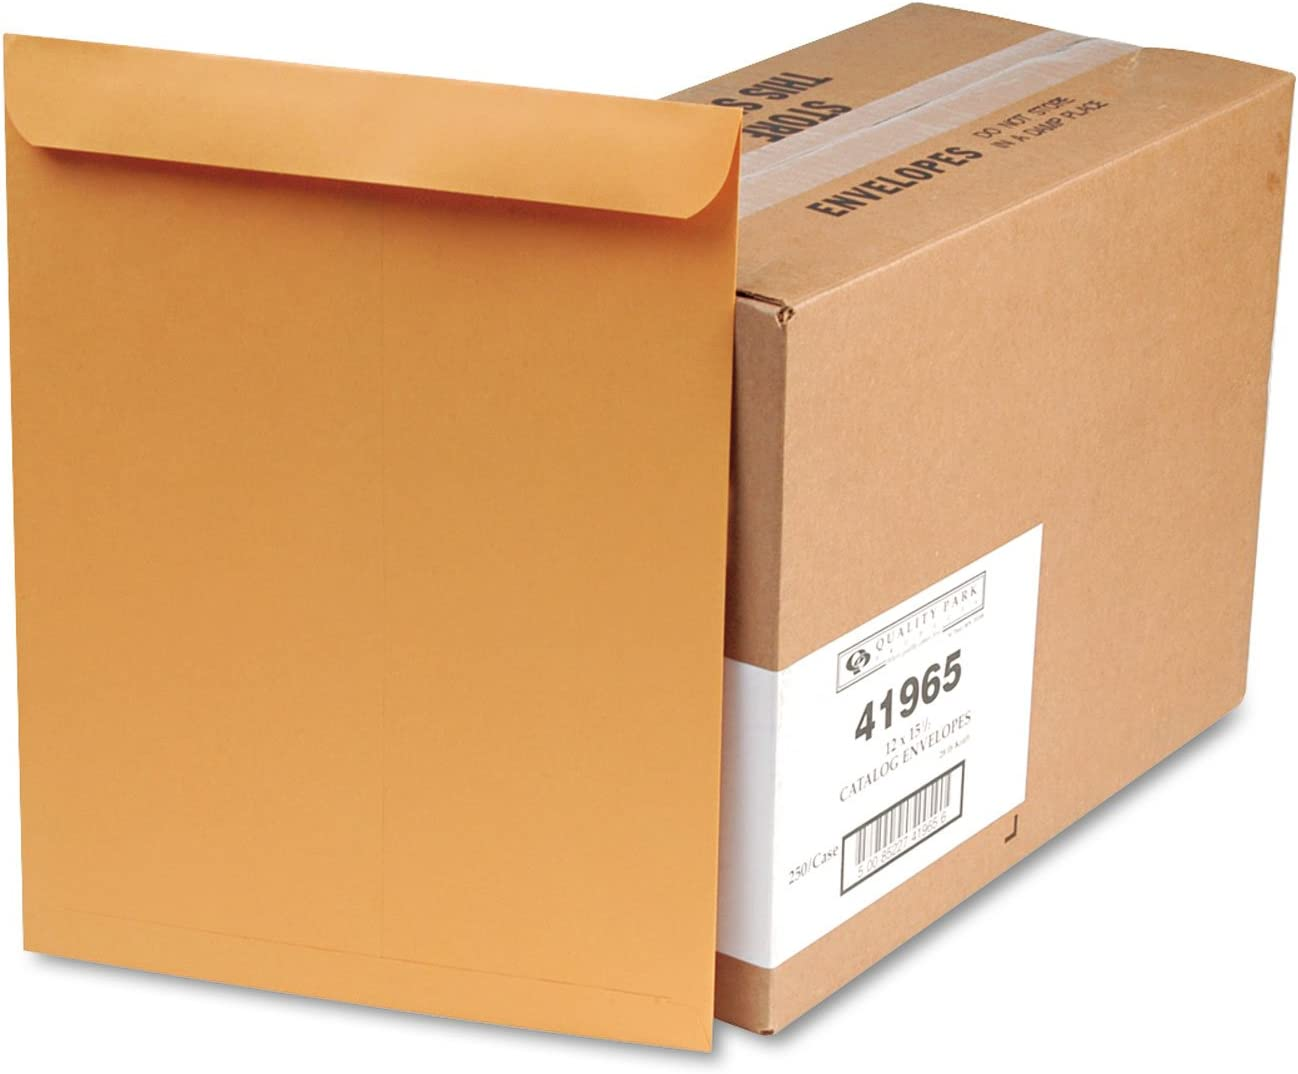 QUA41965 Free Shipping Cheap Bargain Gift - Quality Park Envelopes Catalog Max 80% OFF